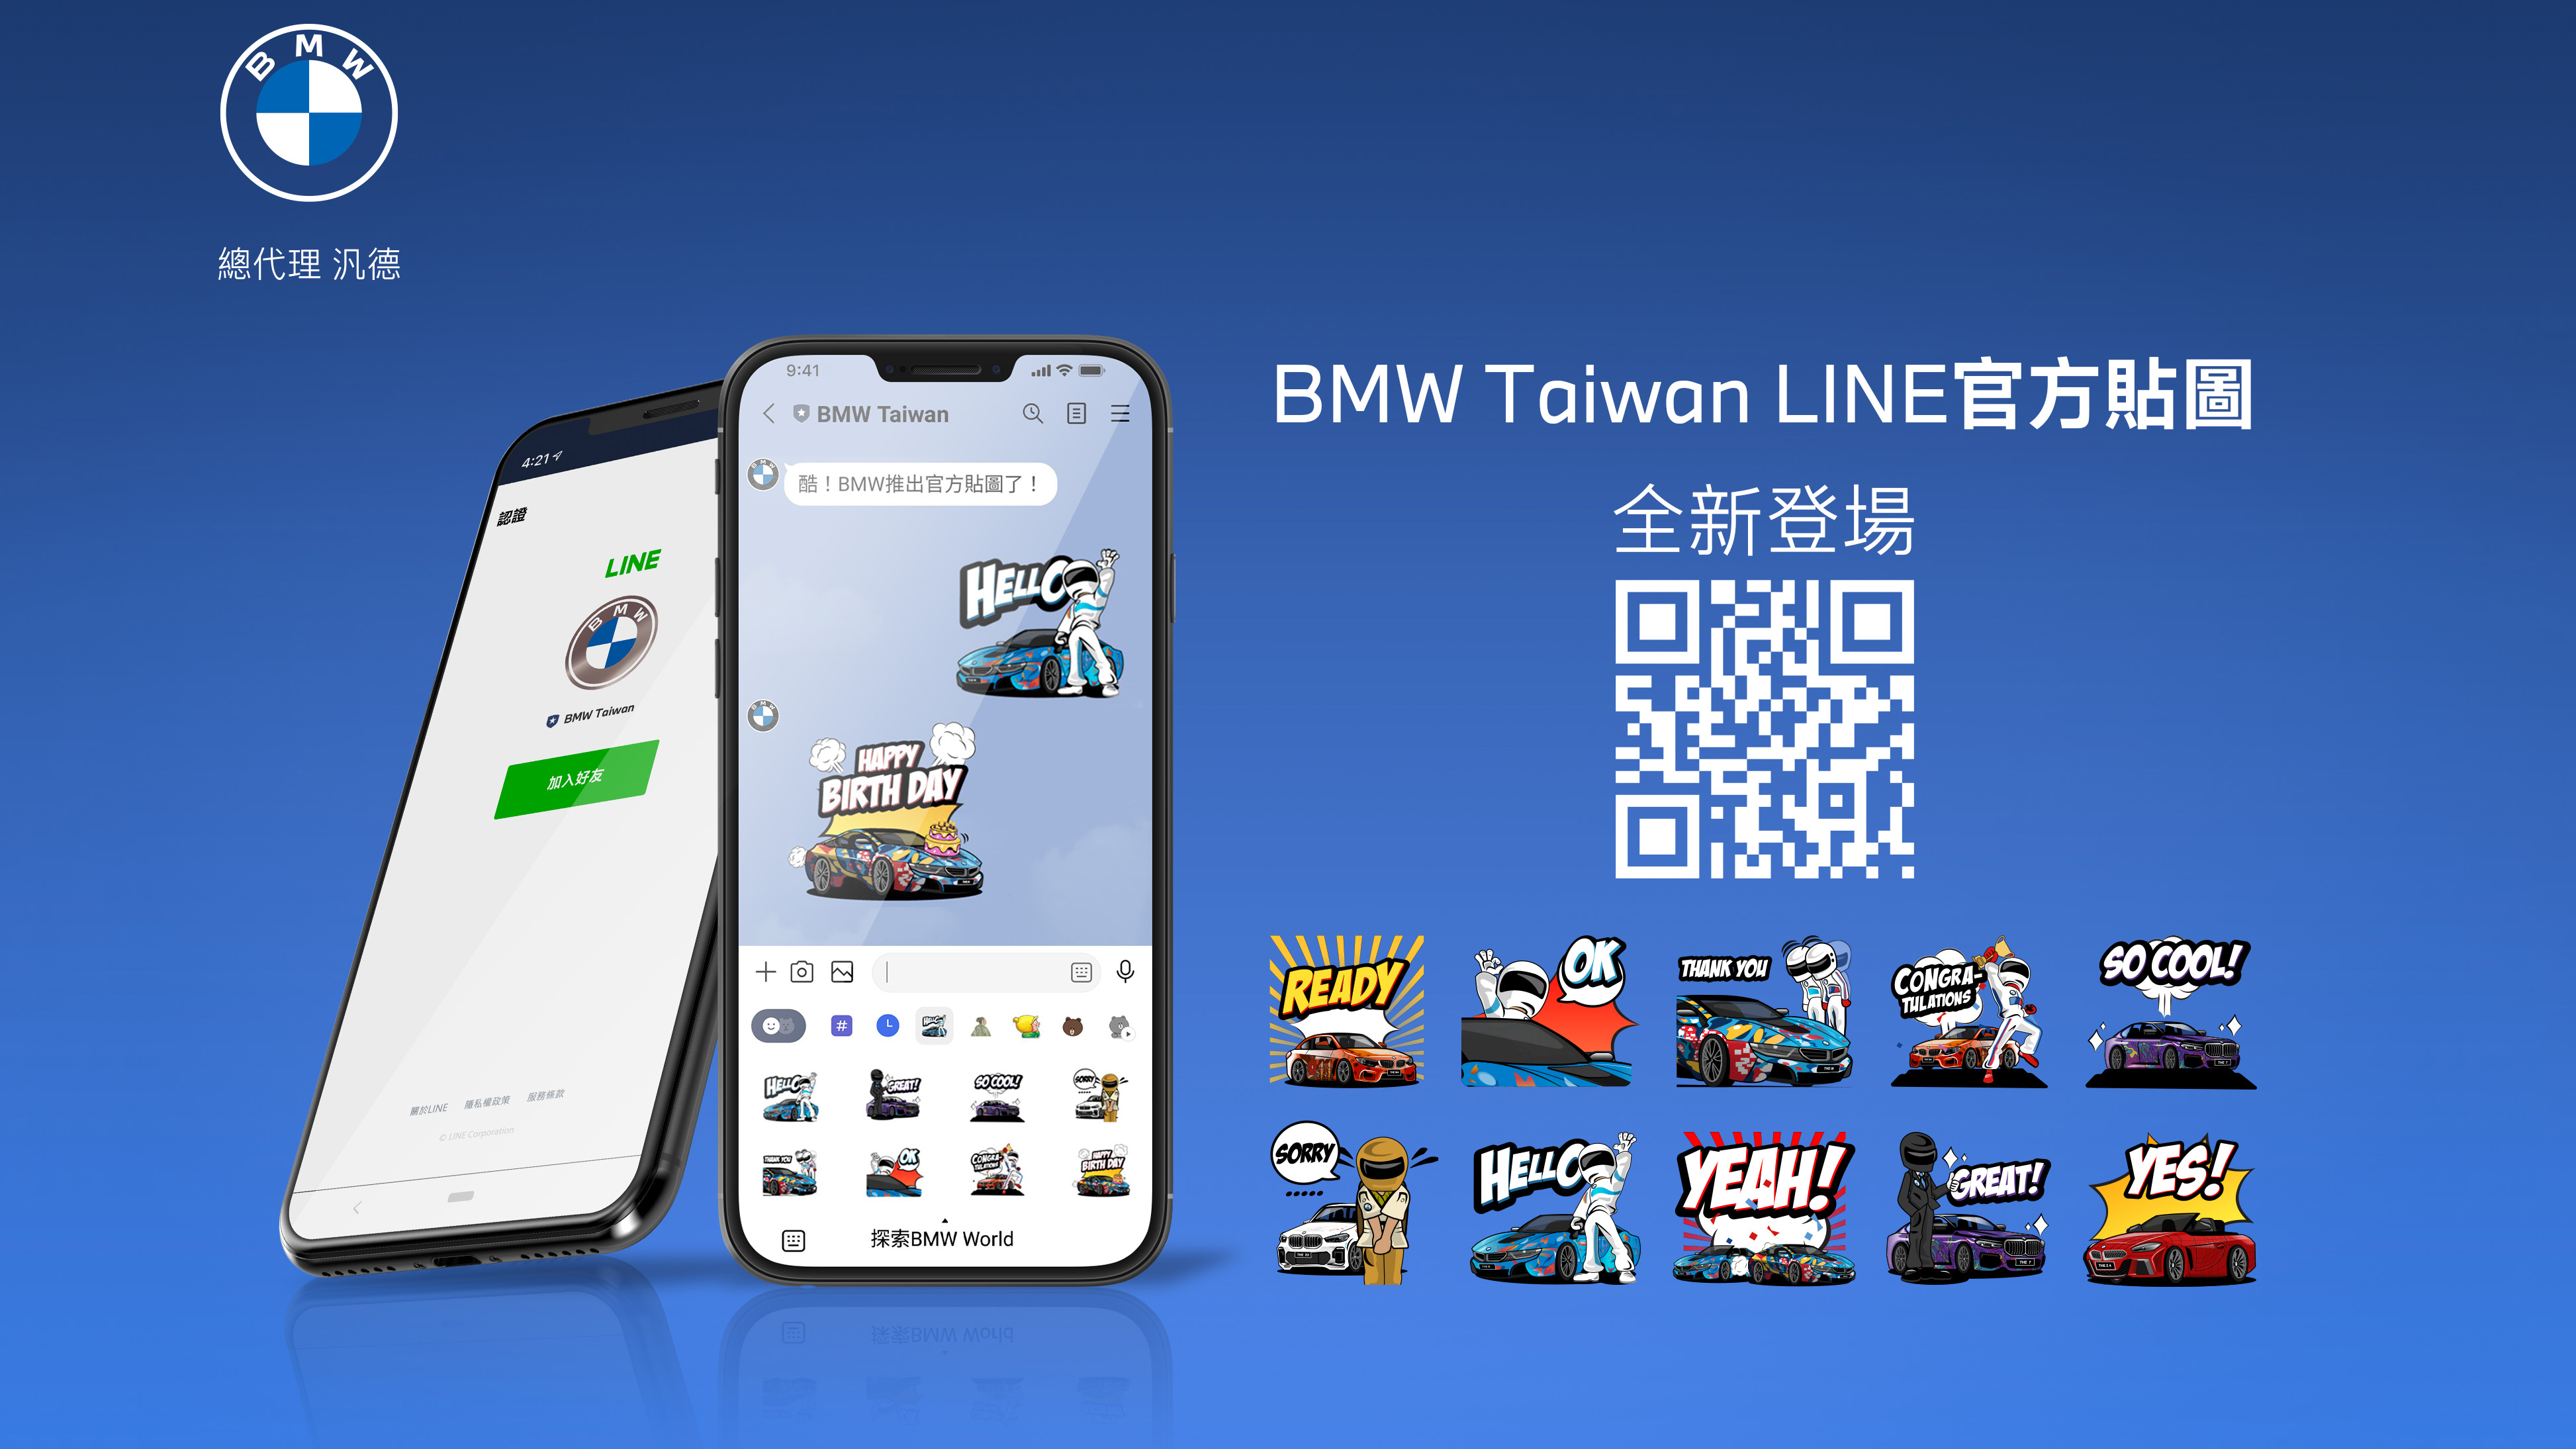 BMW 攜手國際藝術家推 LINE 公益貼圖,收益全數捐出